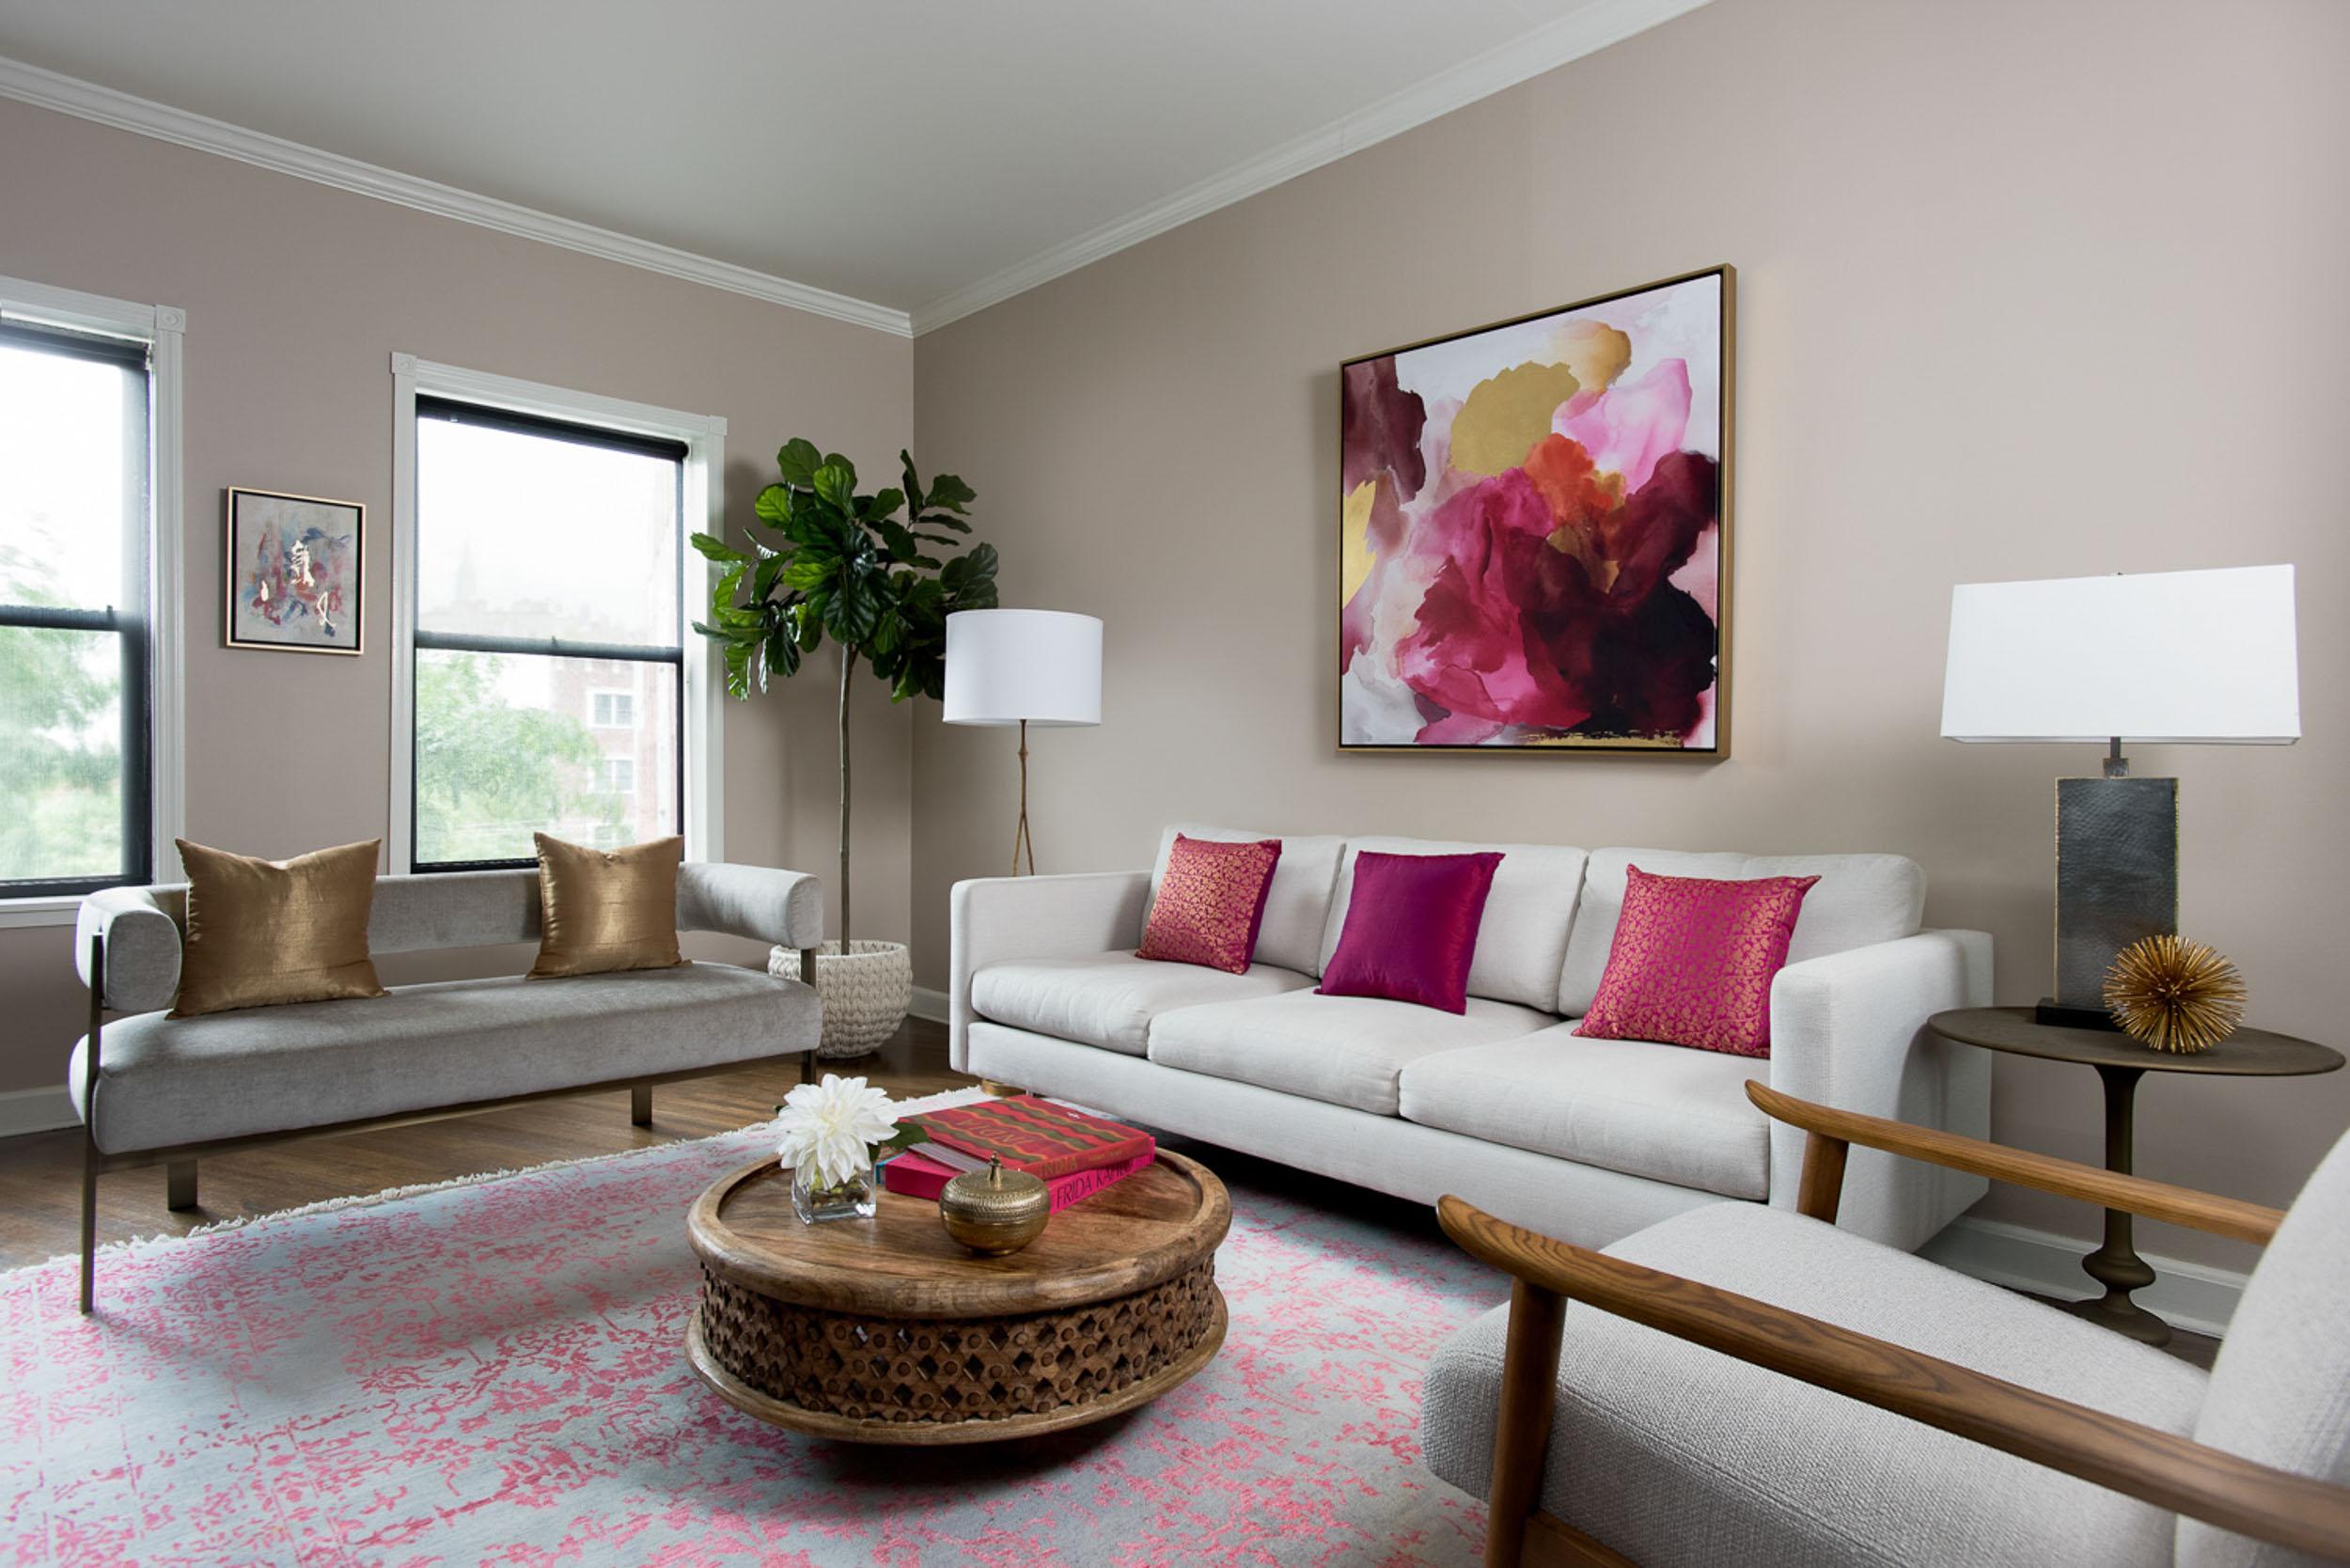 Interior Designer Color Consultant New York New Jersey.jpg